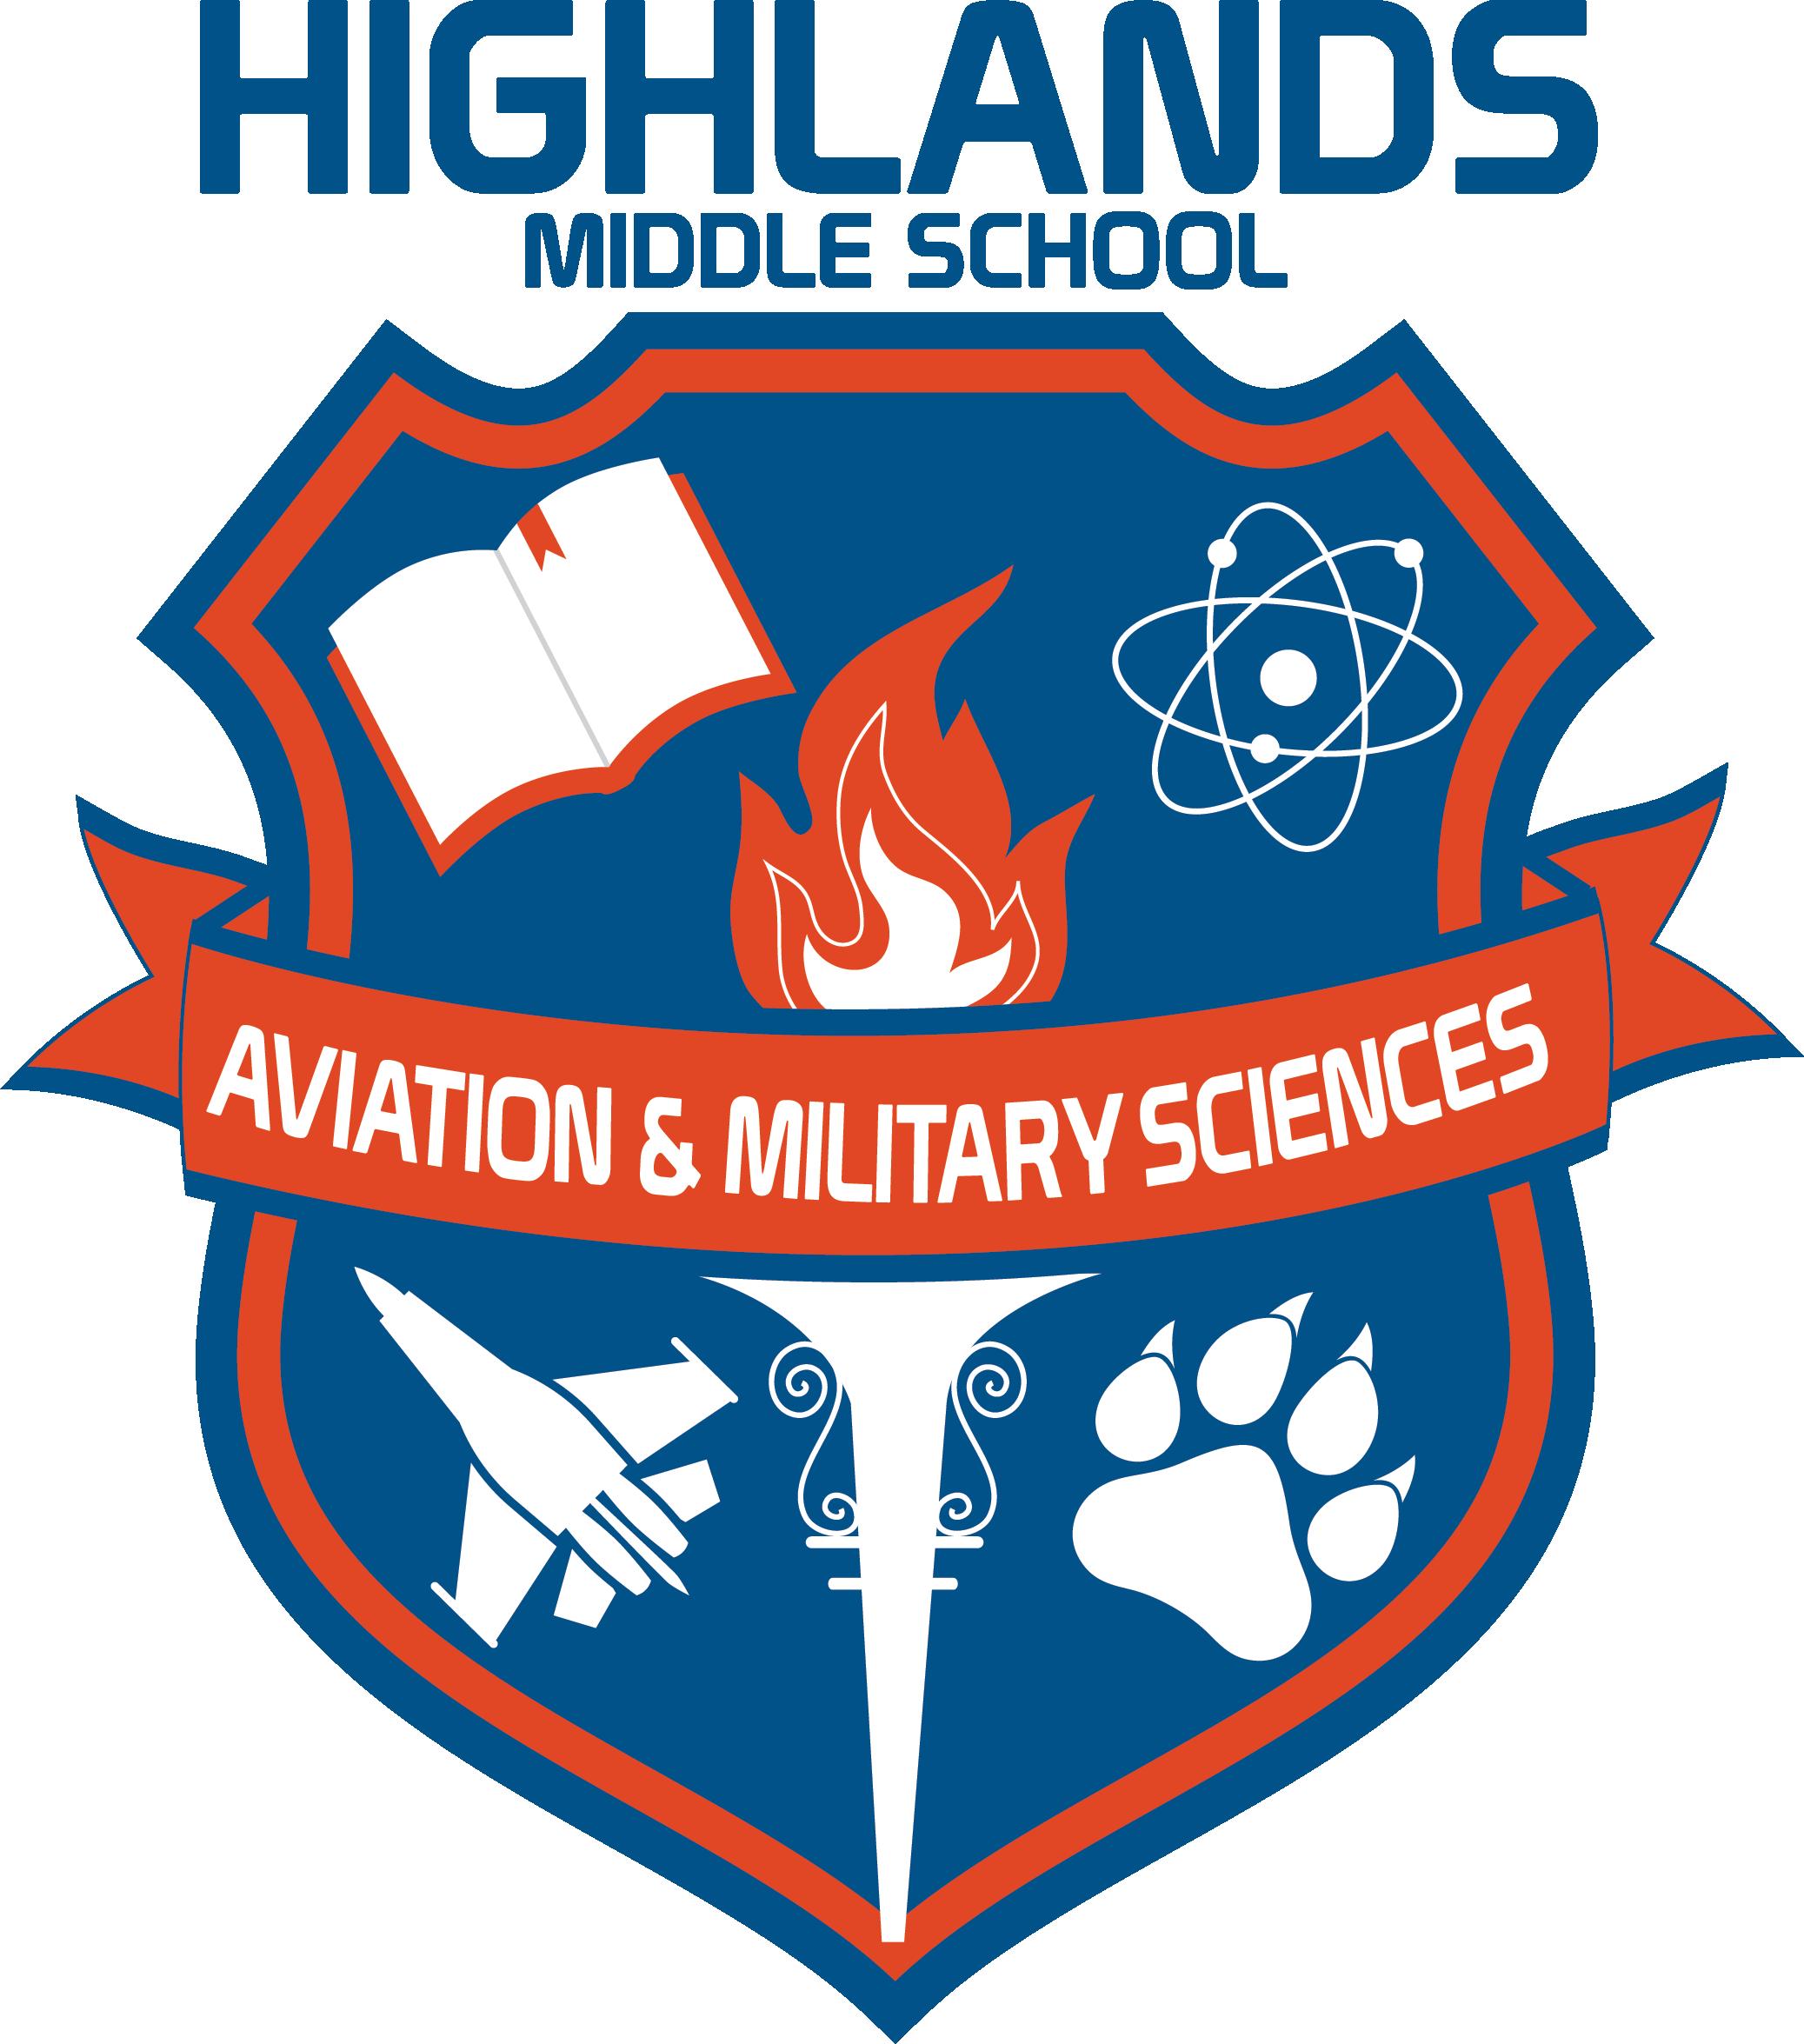 Transparent junior high school clipart - Highlands Middle School - Highlands Middle School Jacksonville Fl